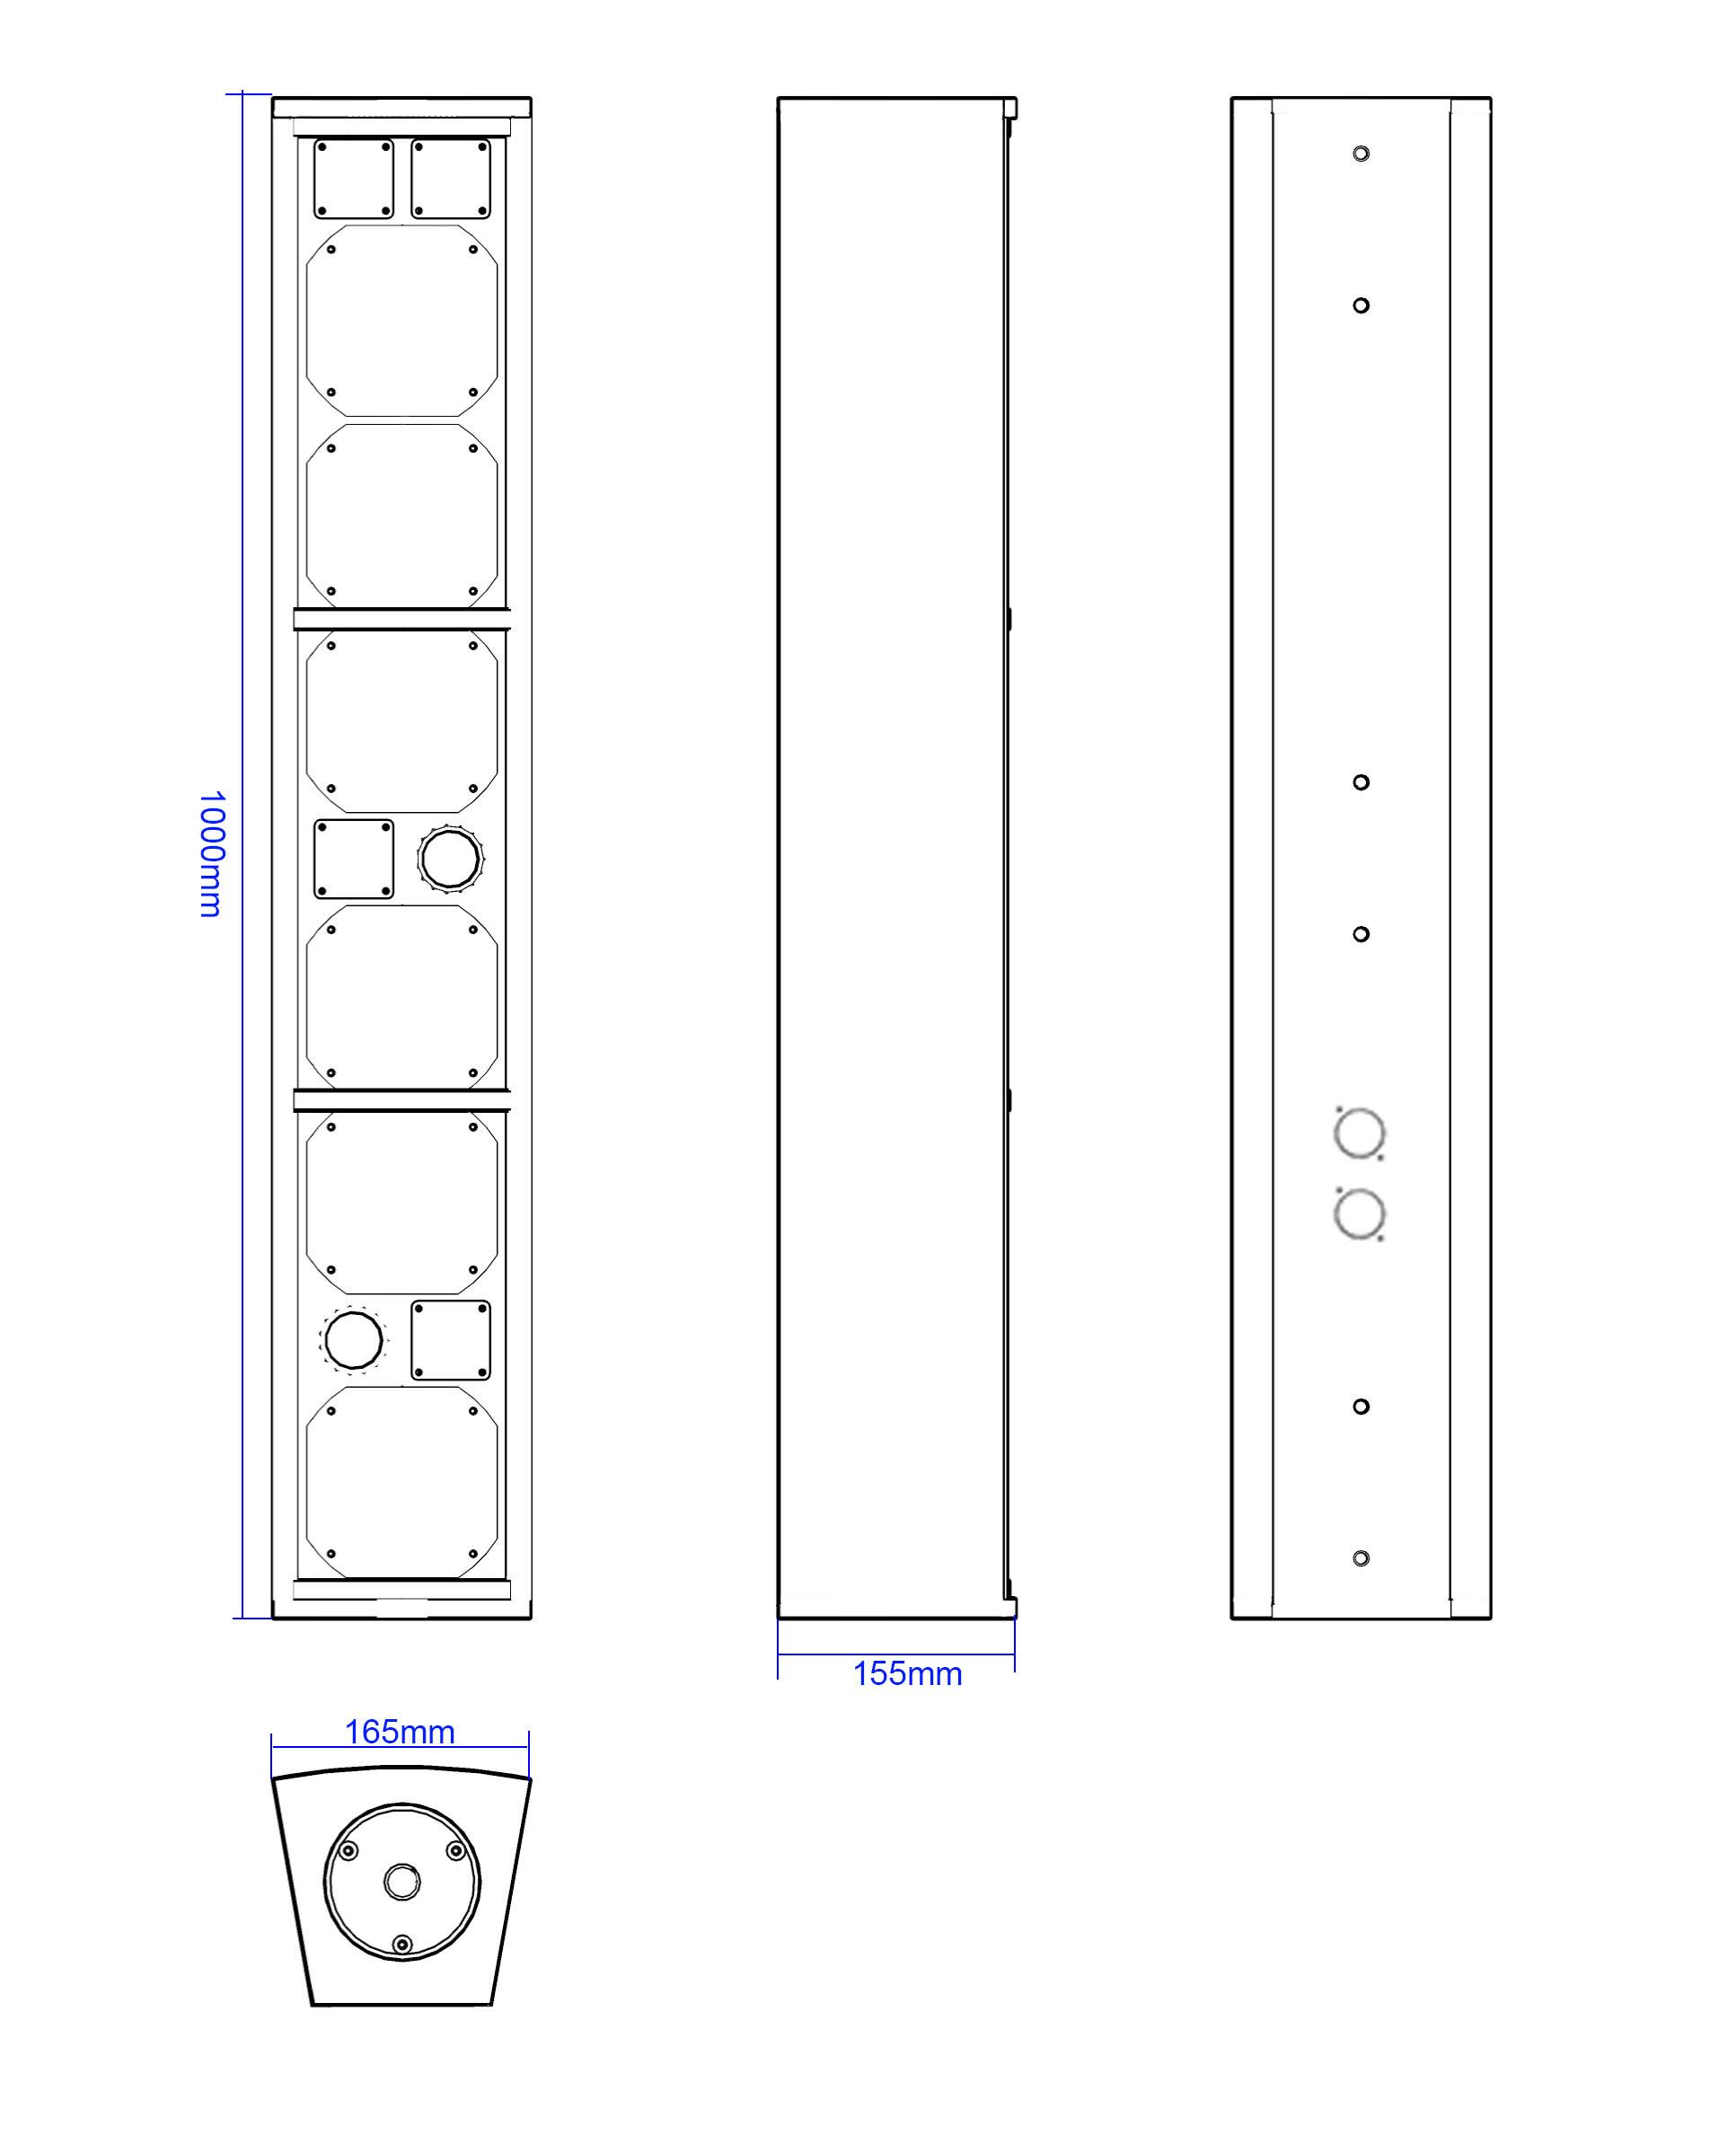 Apt-CLF564 Asymmetrical column array - 1000, 165, 155mm